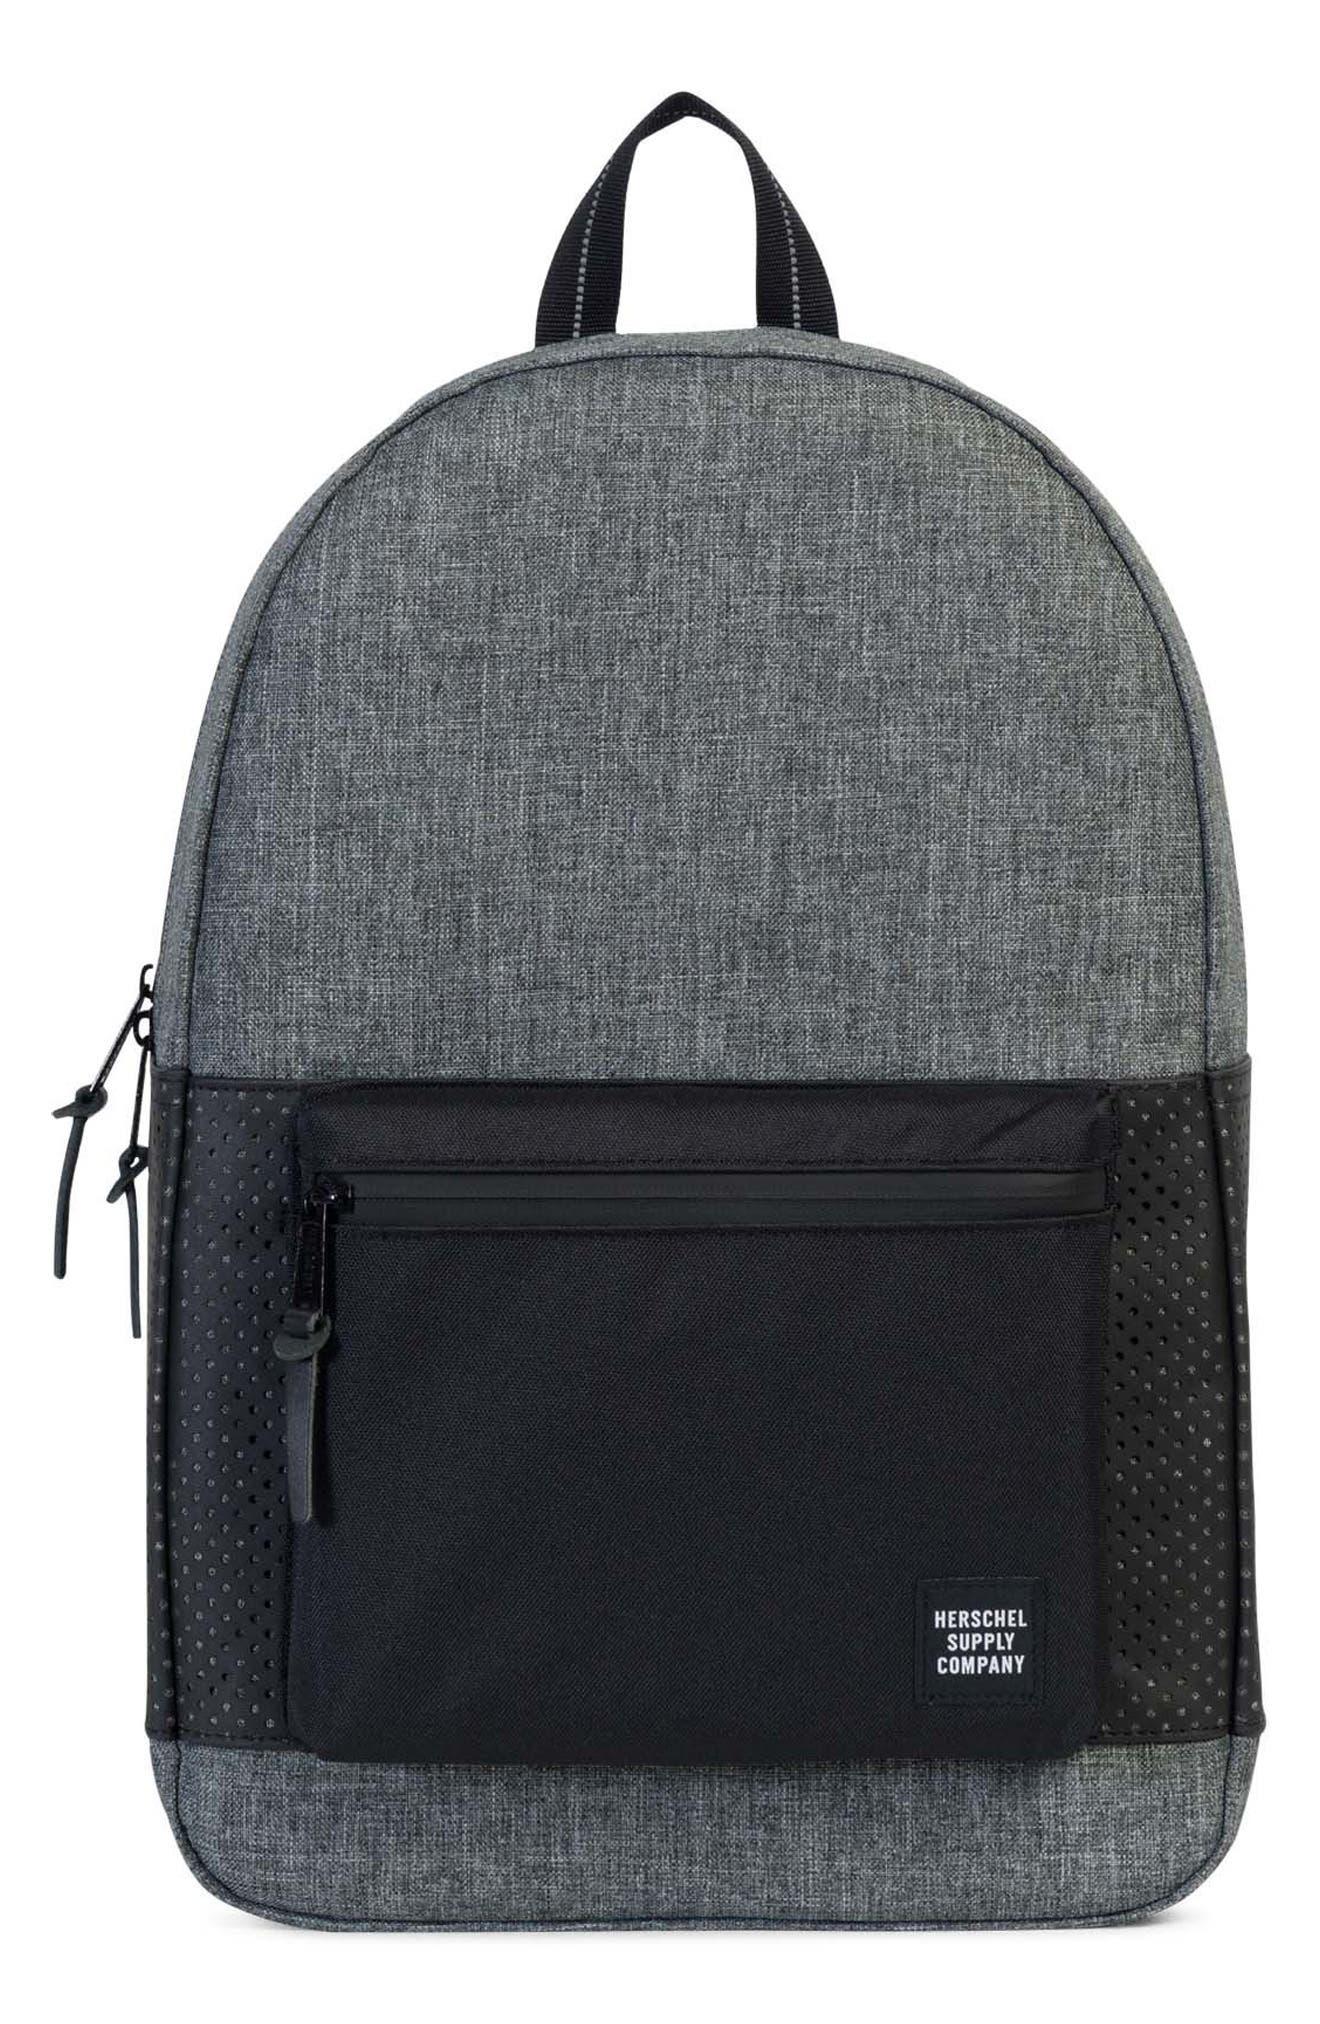 Main Image - Herschel Supply Co. Settlement Aspect Backpack